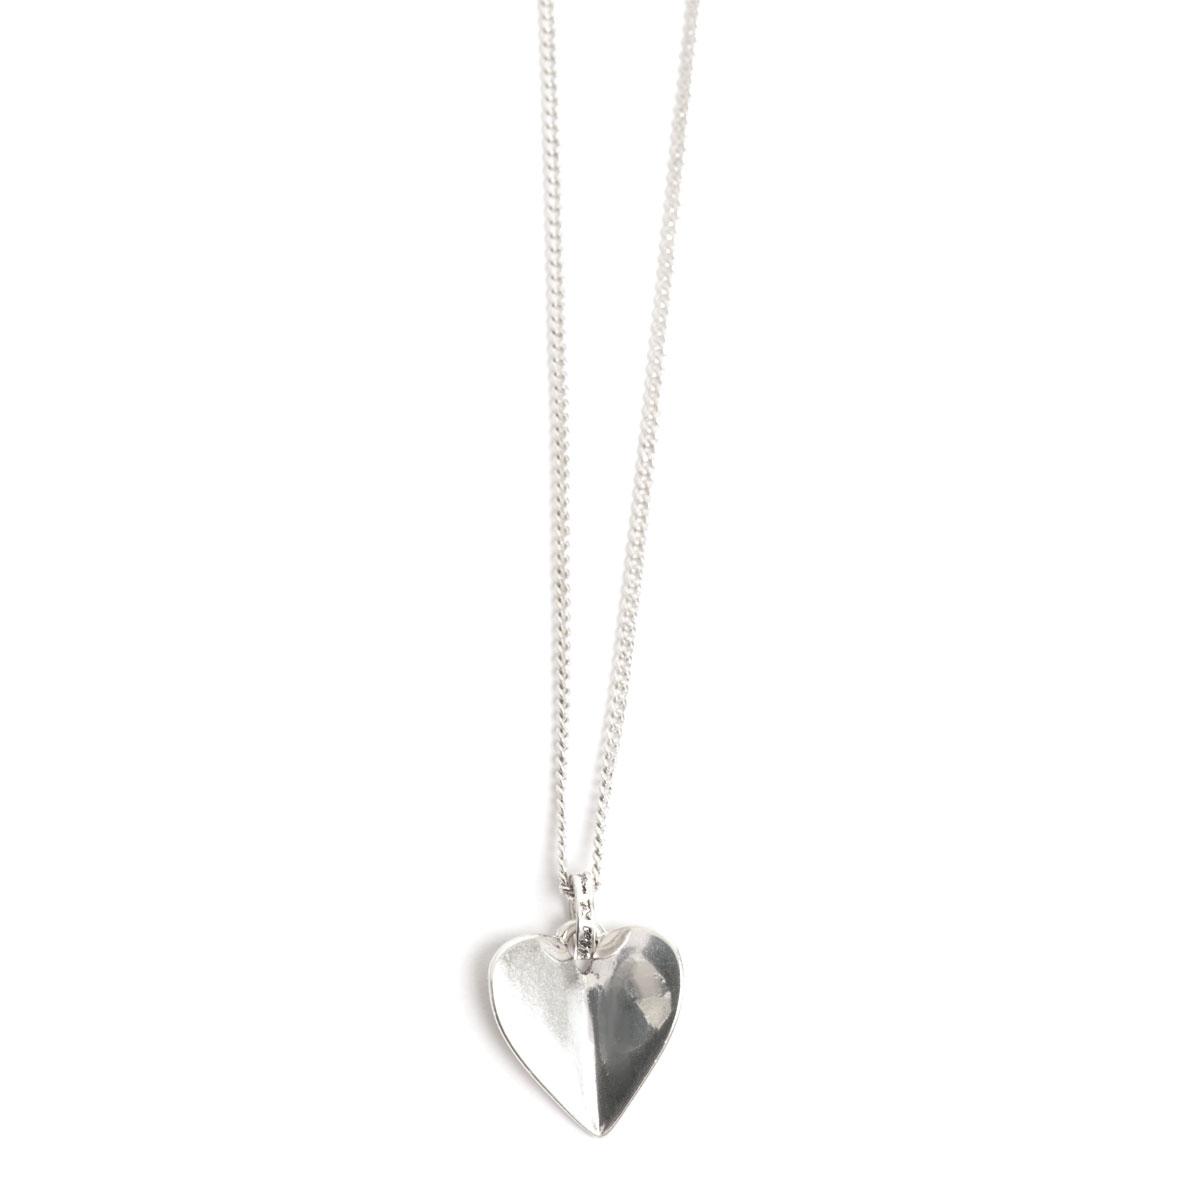 Колье(2018-0650)Angled Heart<br>Длина колье 45 см<br>